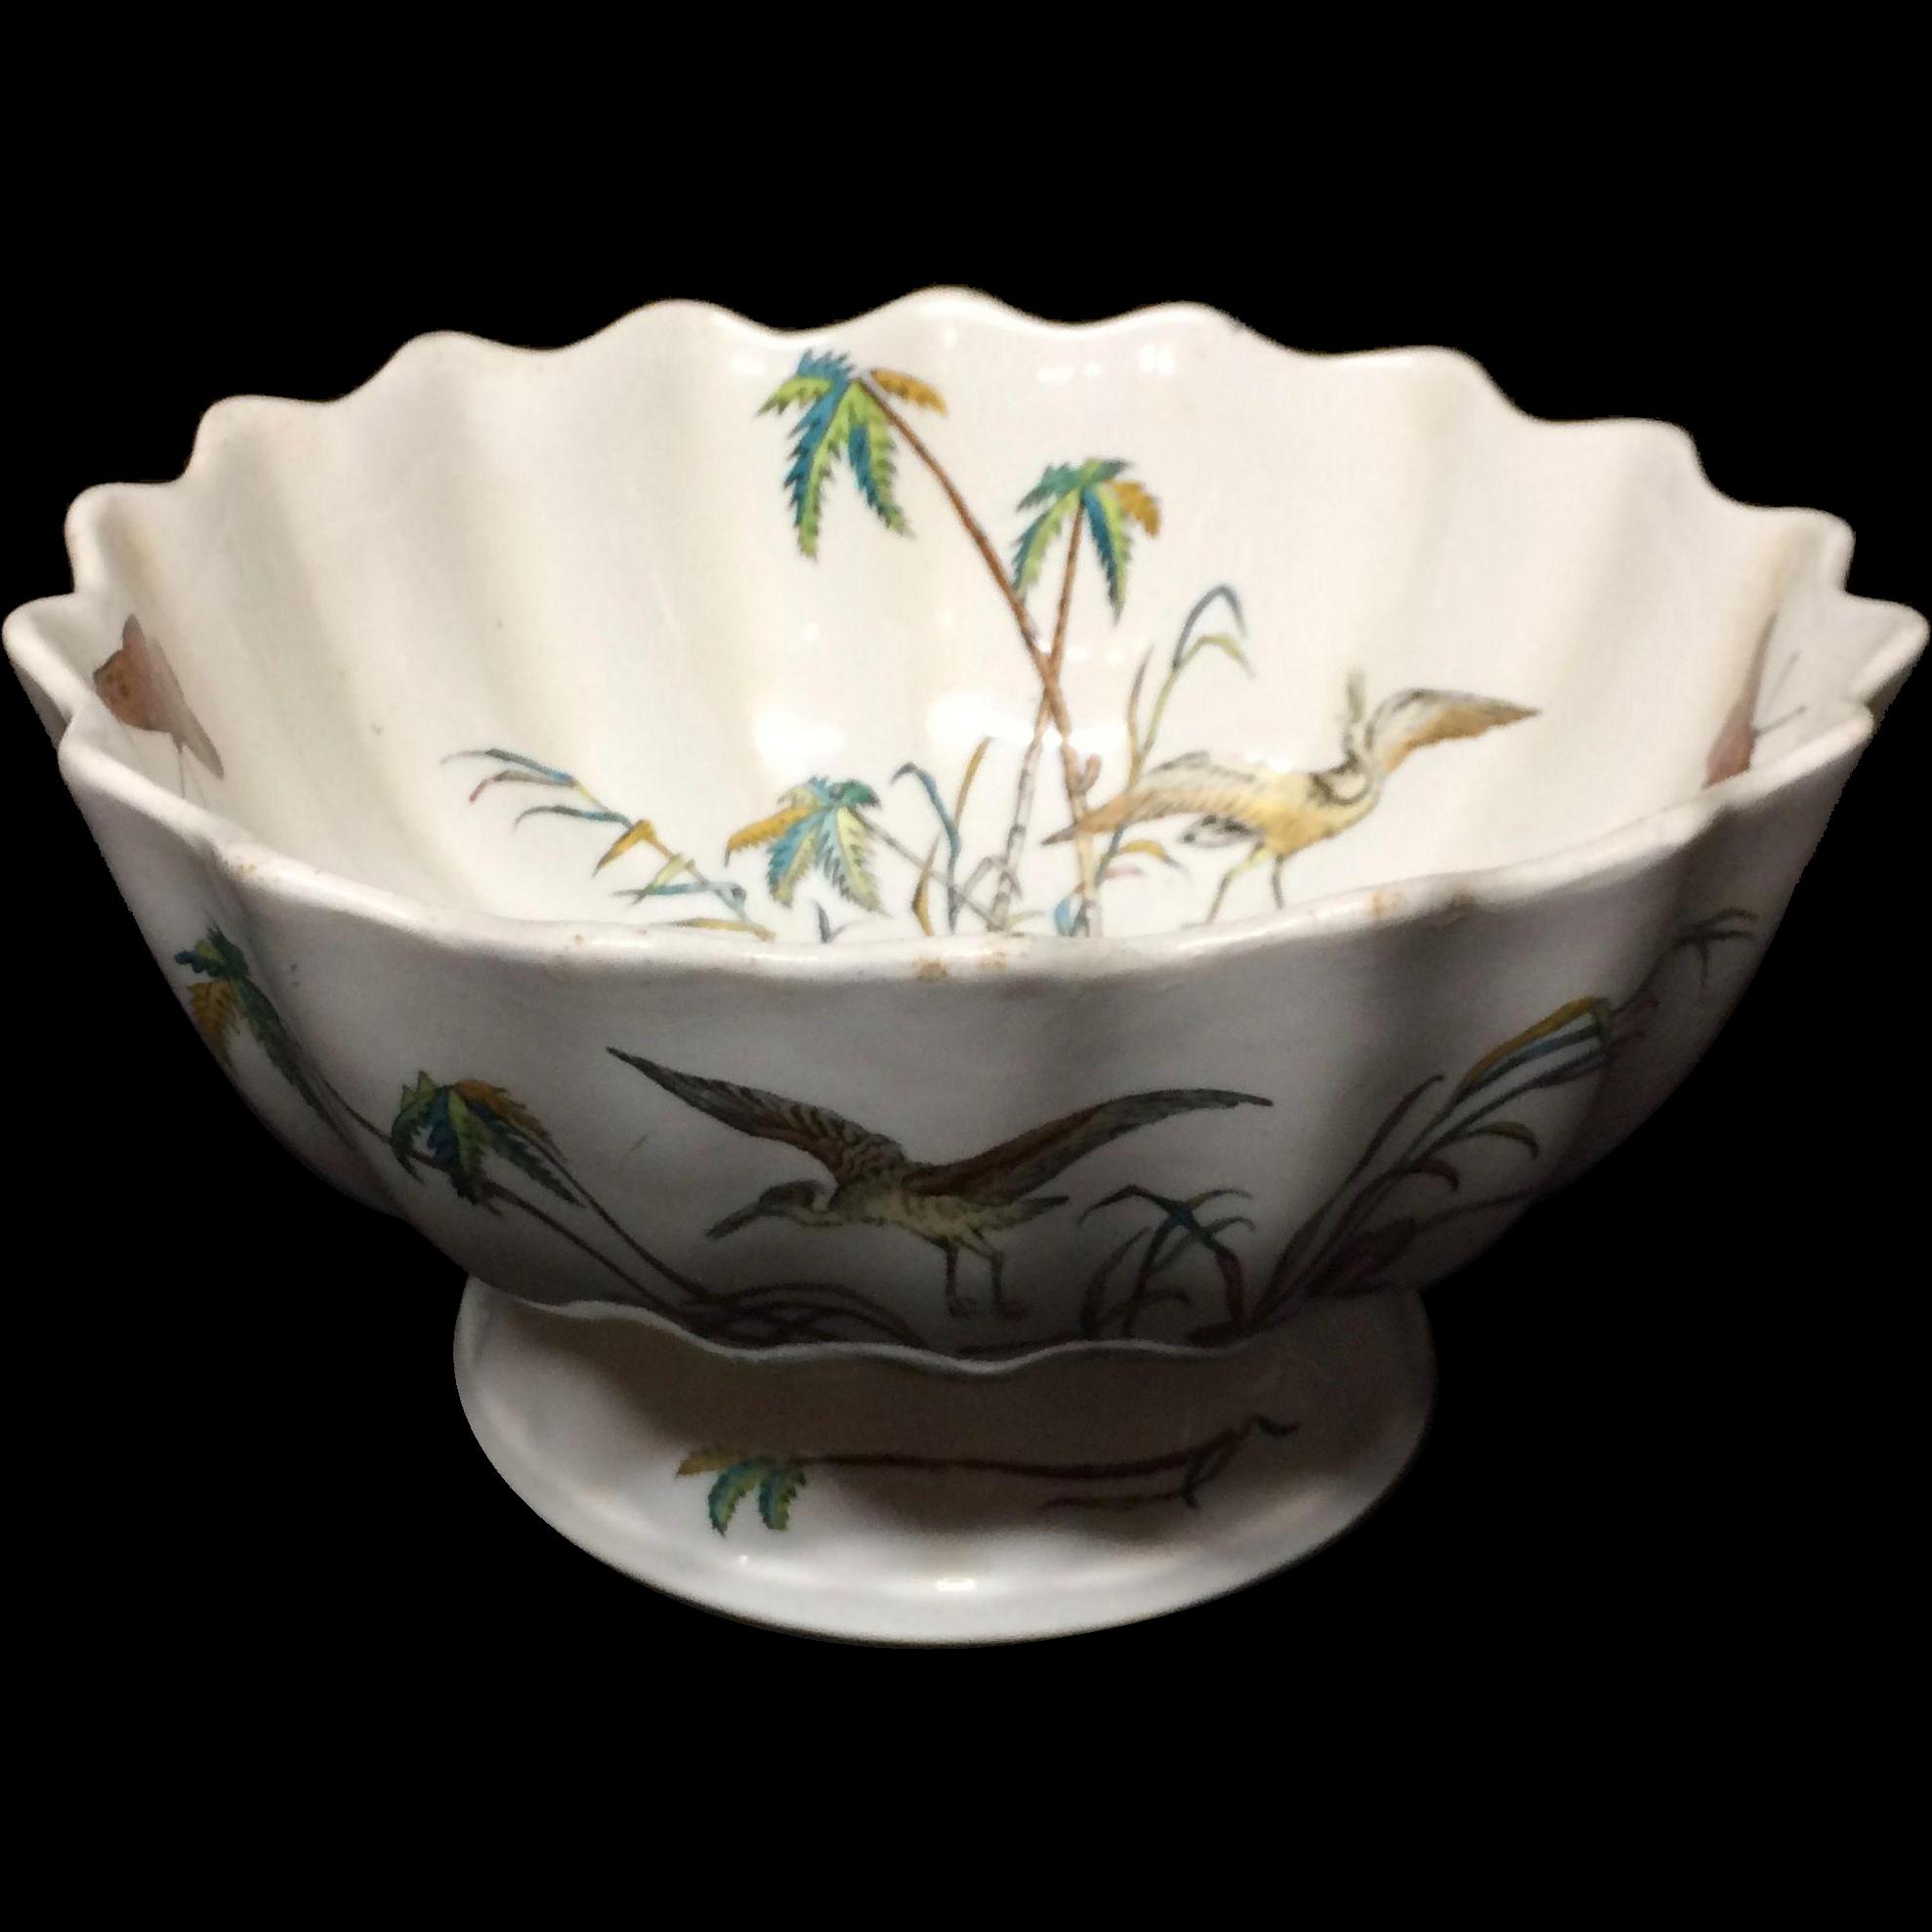 Early Copeland Polychrome Centerpiece Bowl ~ PALMS EGRET 1878